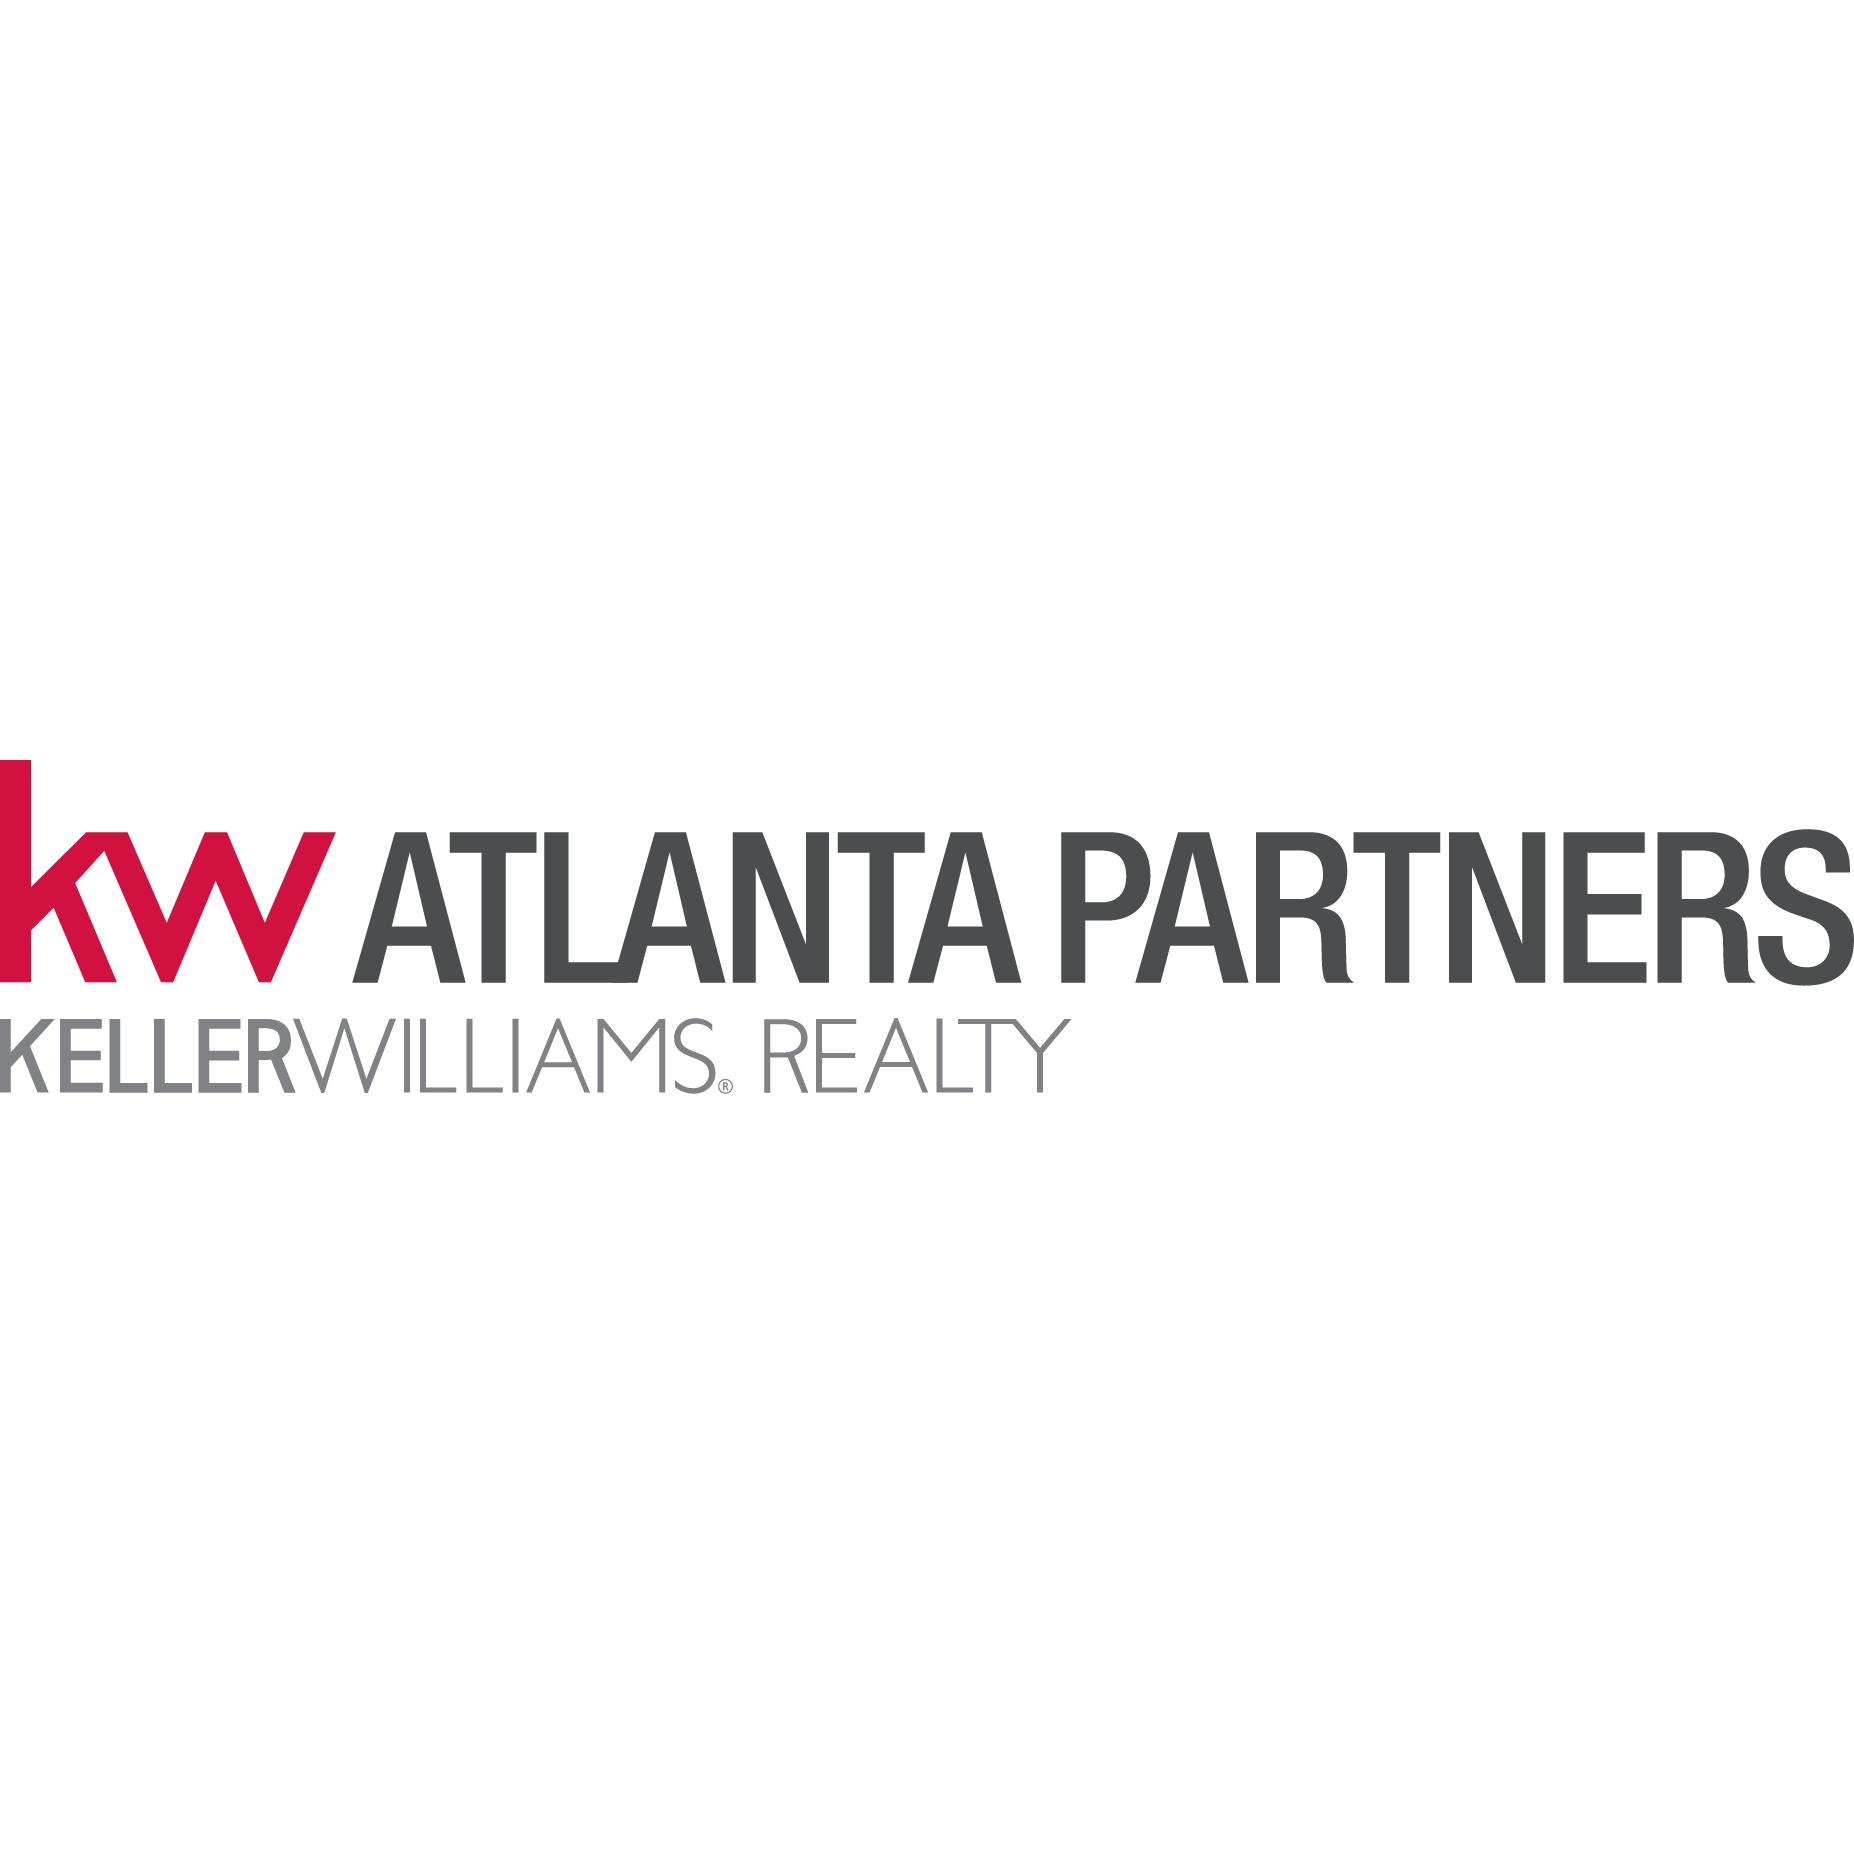 Janet Davis, Realtor - Keller Williams Atlanta Partners